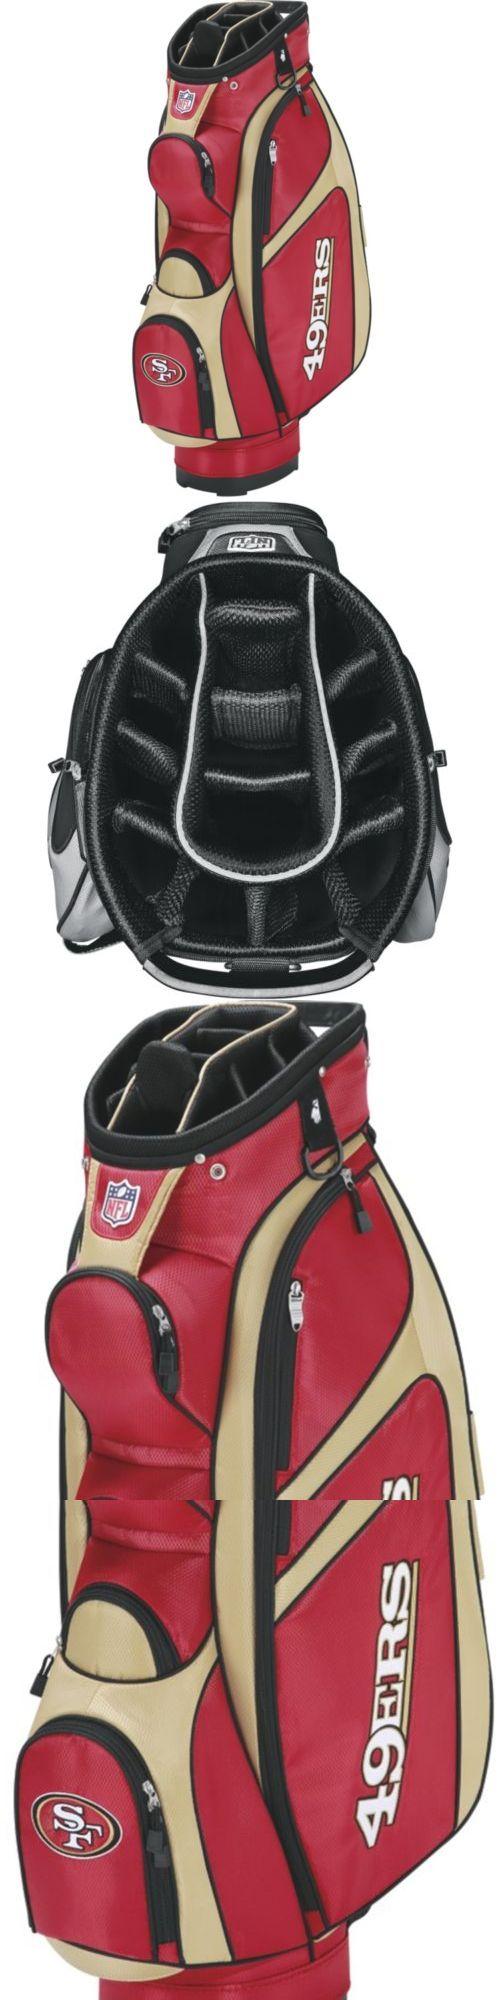 Golf Club Bags 30109: Wilson Nfl San Francisco 49Ers Cart Golf Bag, Scarlet Gold -> BUY IT NOW ONLY: $137.16 on eBay!